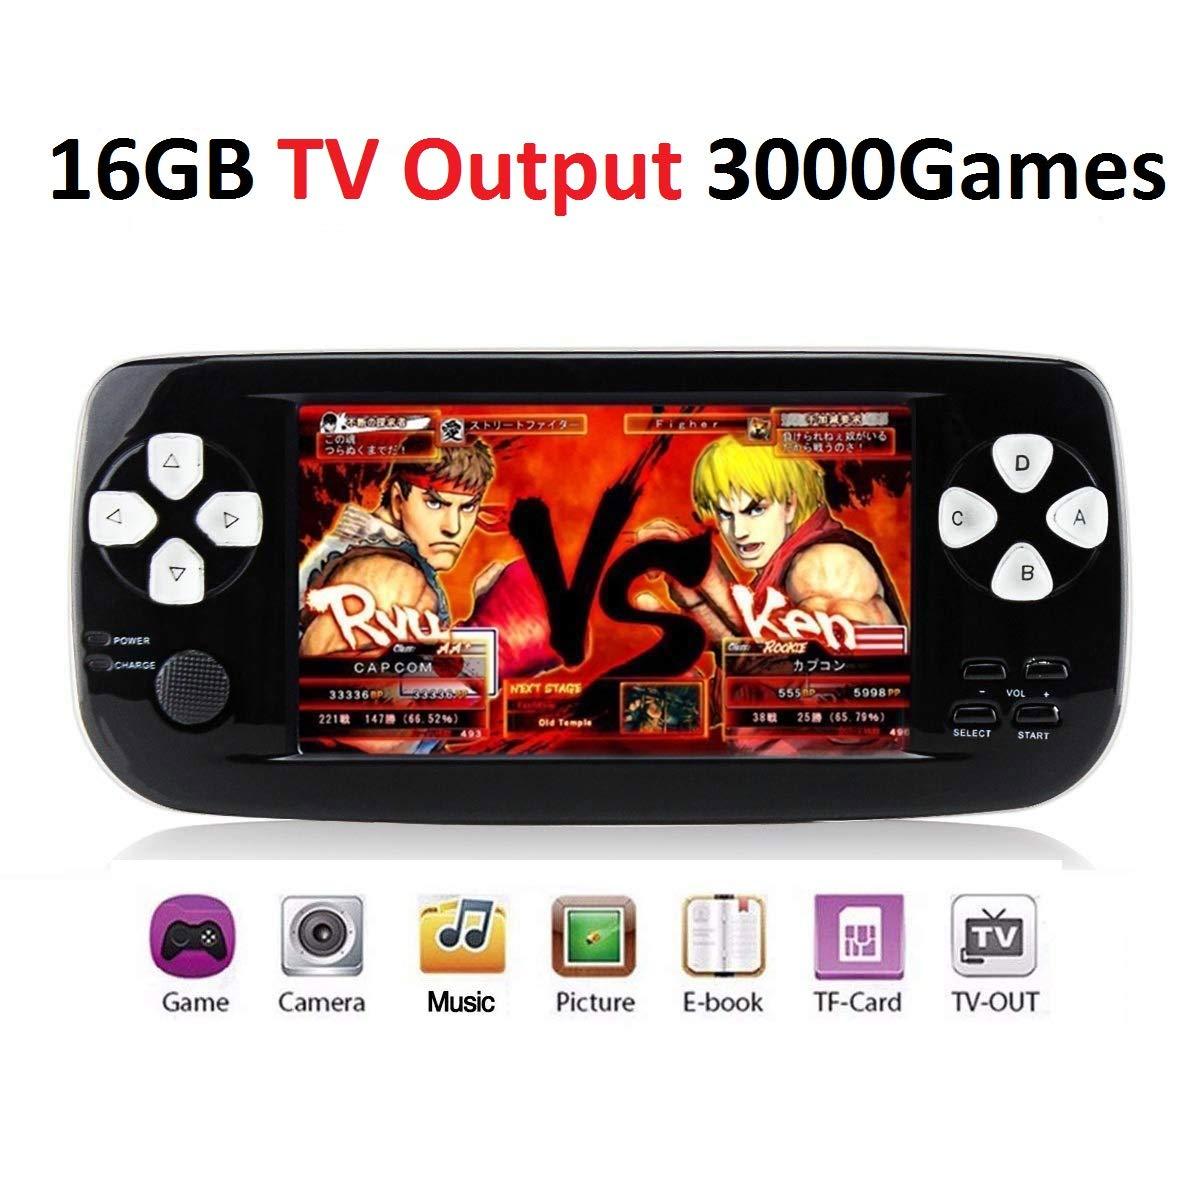 MJKJ Handheld Game Console , Portable Video Game Console 4.3 Inch 3000 Classic Retro Game Console Pap-KIII , Support GBA / GBC / GB / SEGA / NES / SFC / NEOGEO – White